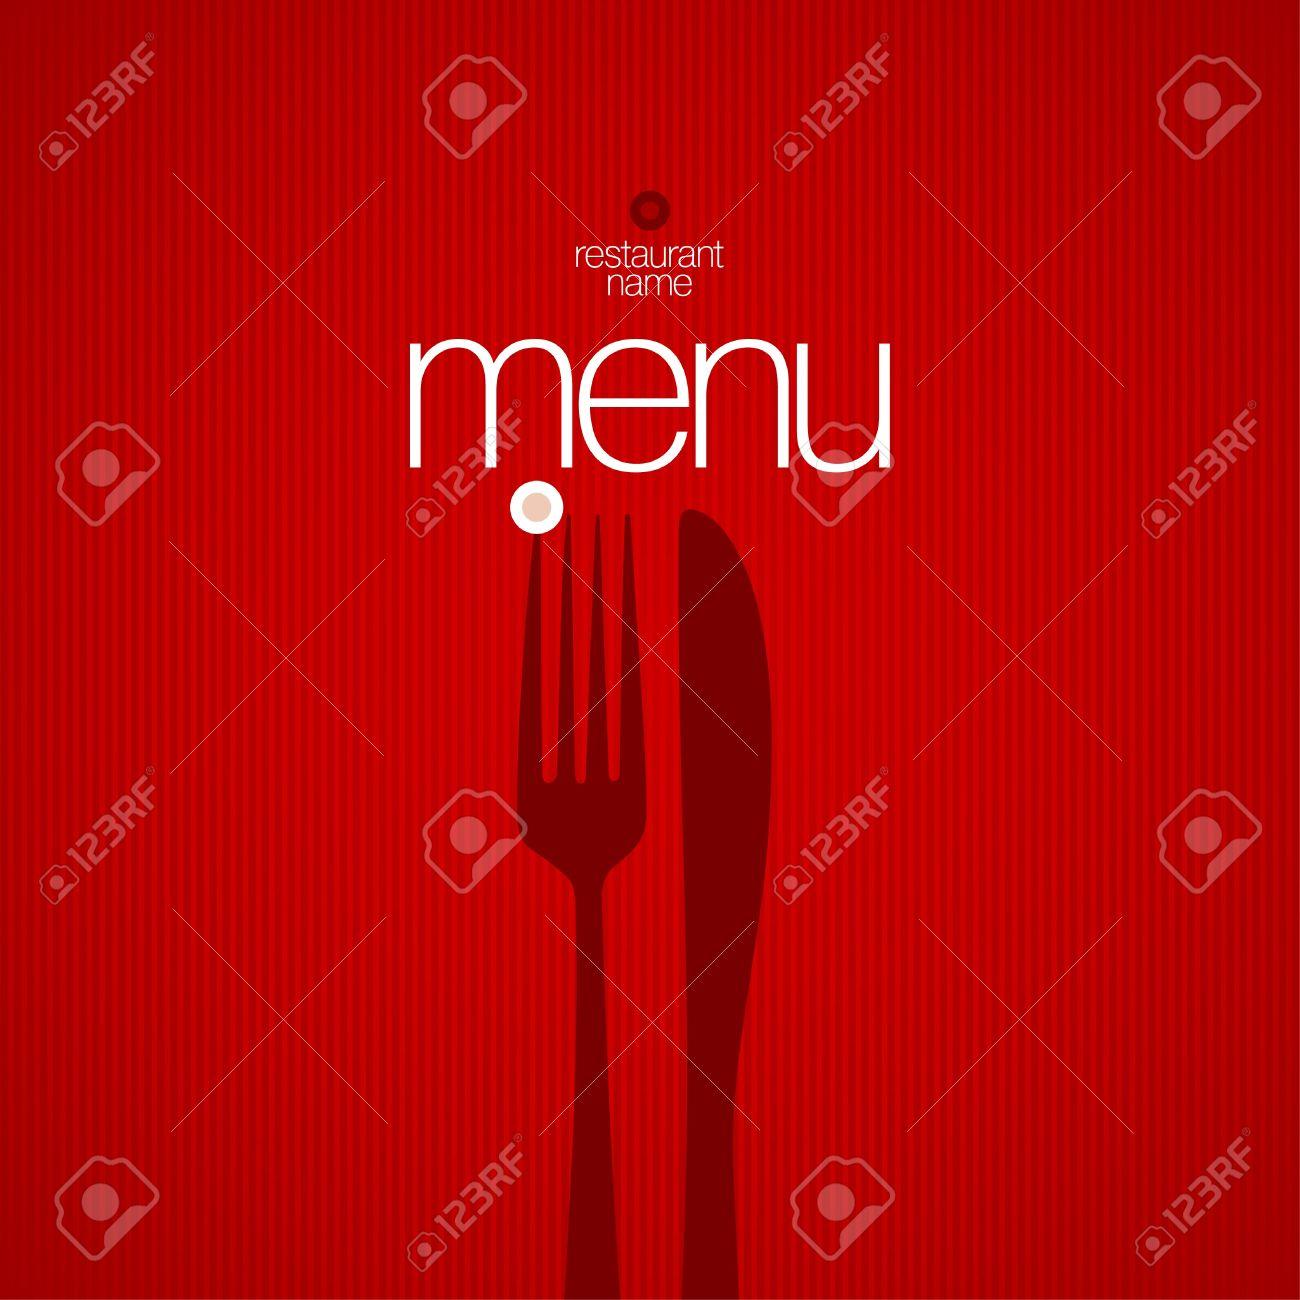 restaurant menu card design template. royalty free cliparts